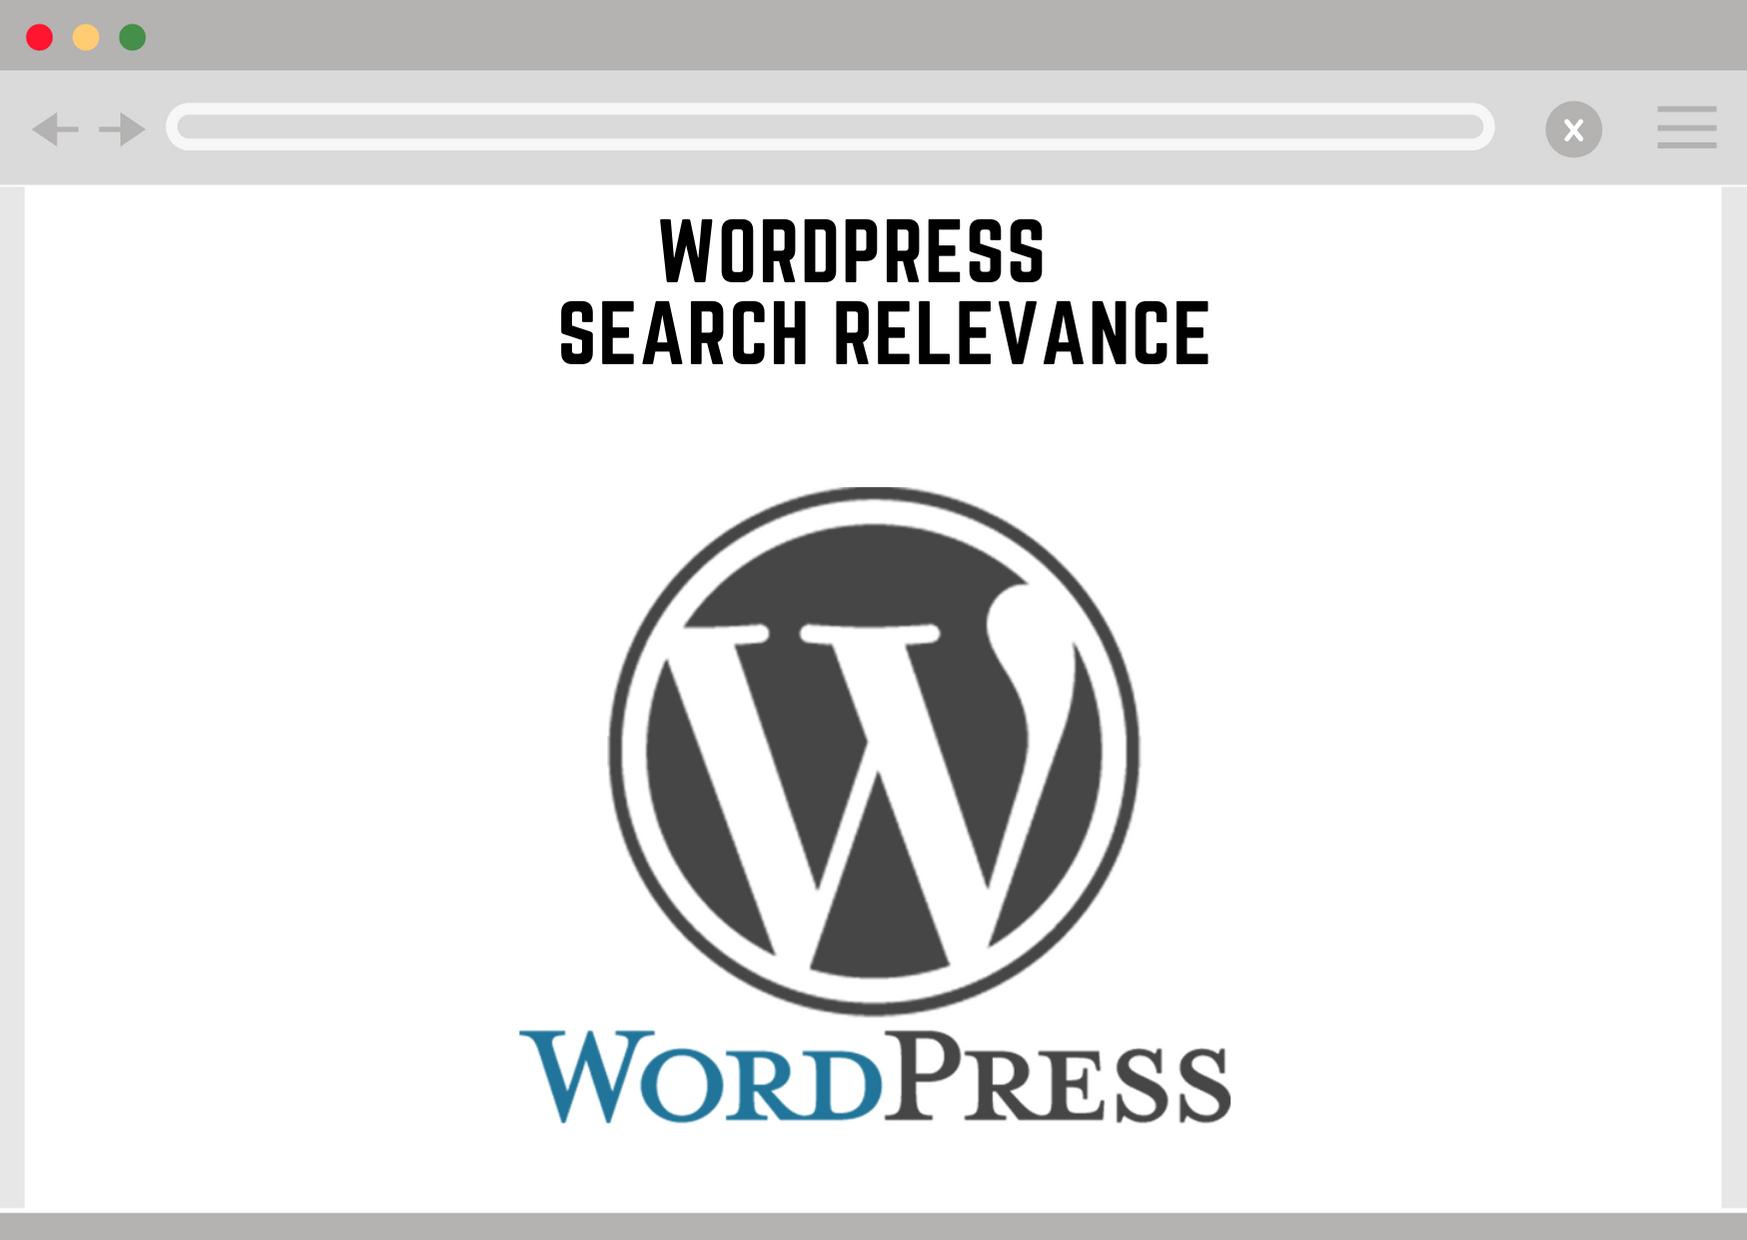 Wordpress Search Relevance